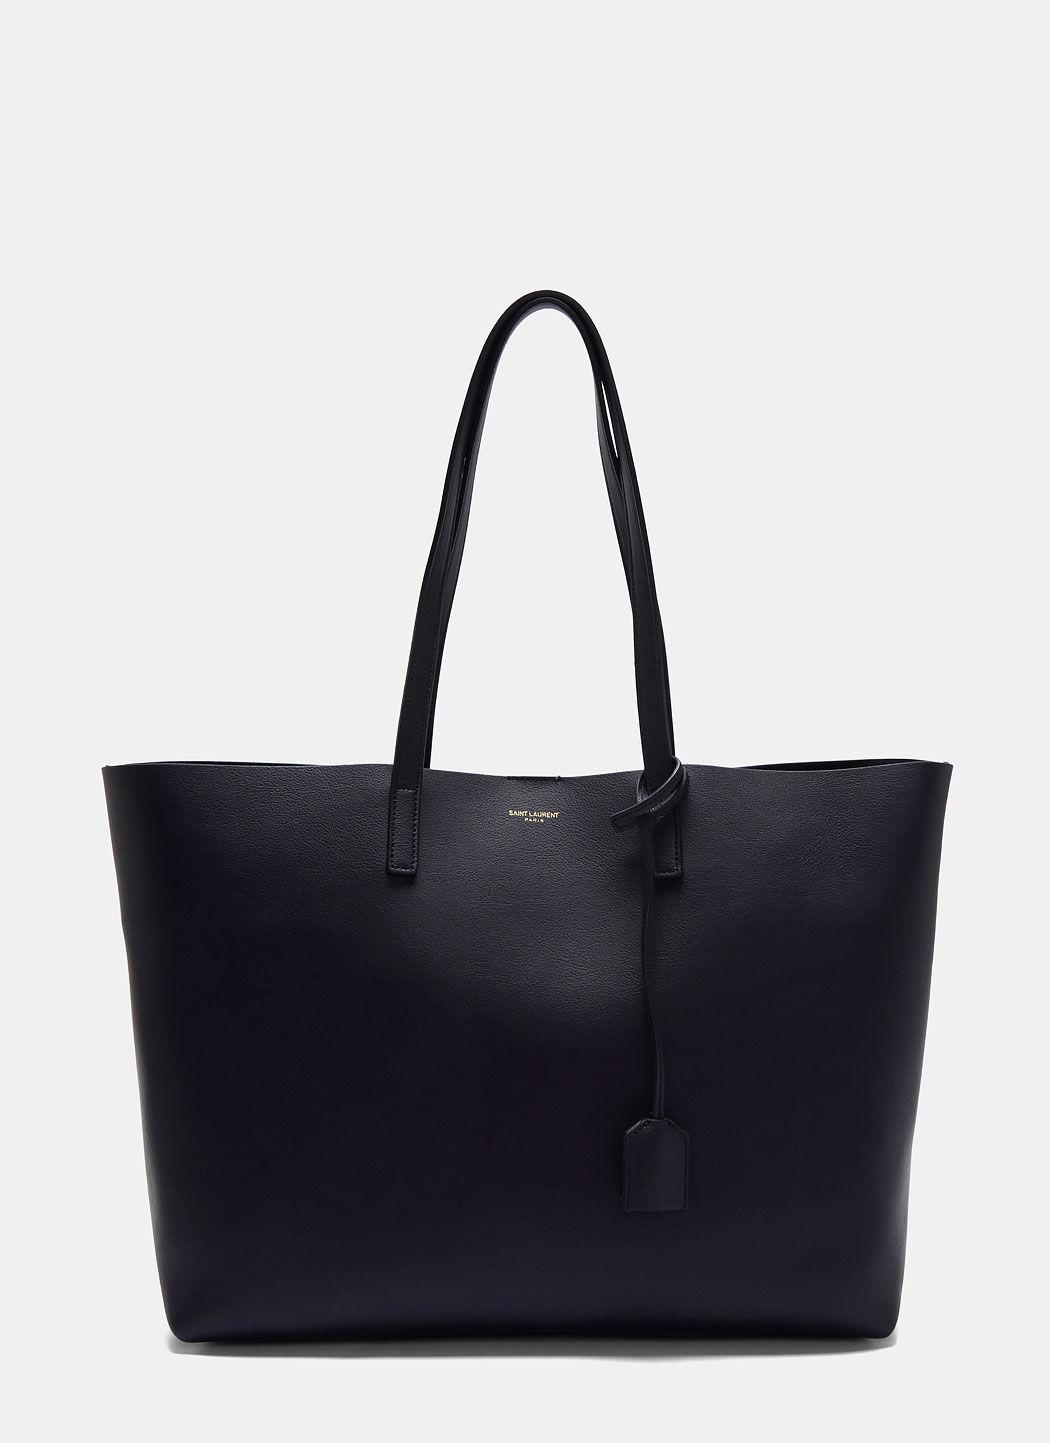 Saint Laurent Large Shopper Tote Bag In Black In Navy